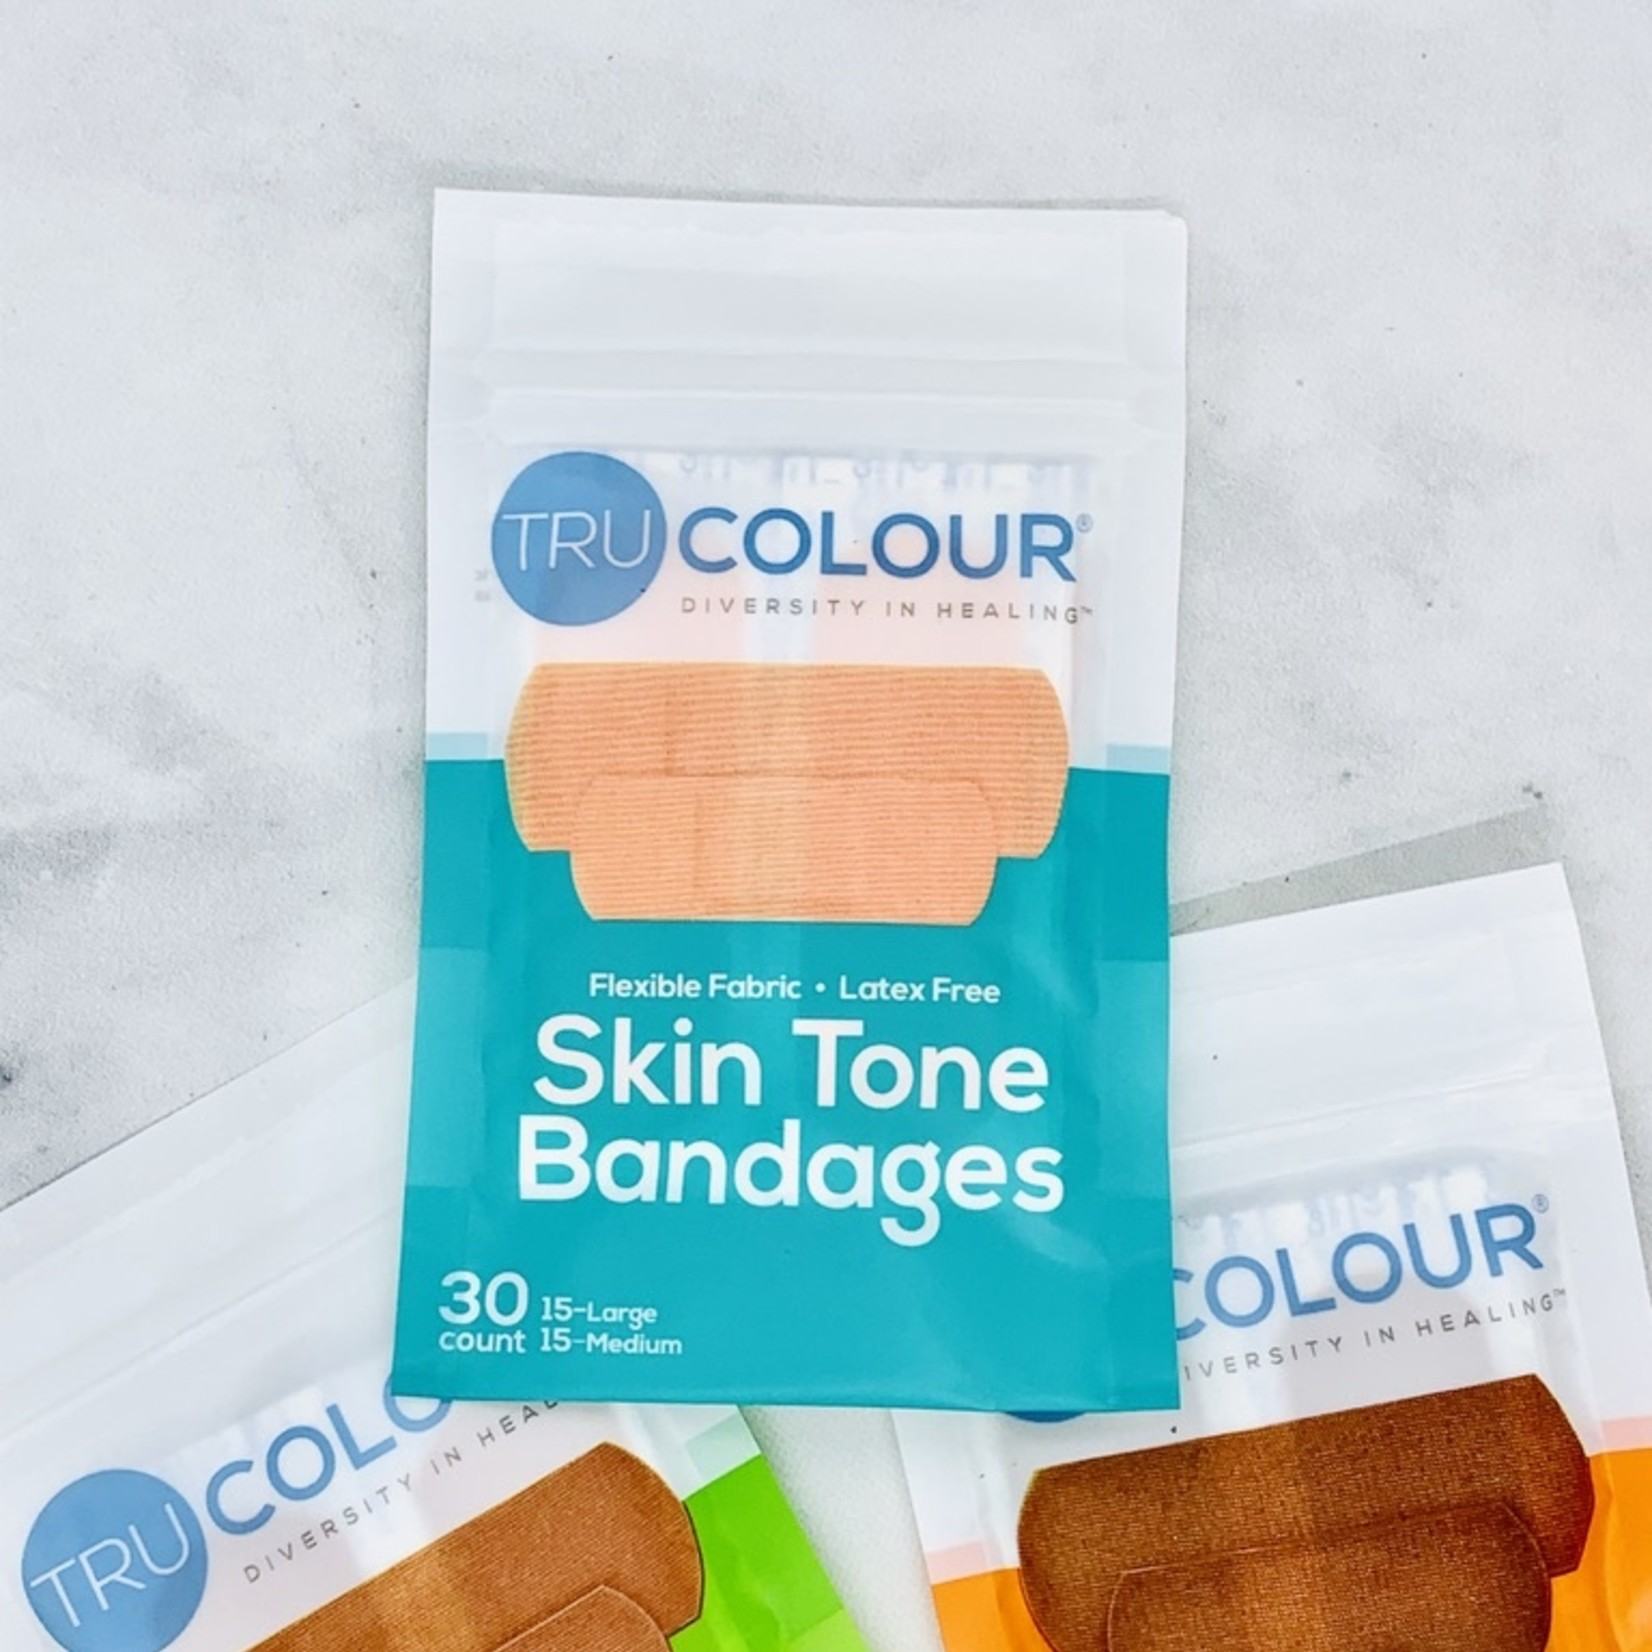 TruColour TruColour Skin Tone Bandages